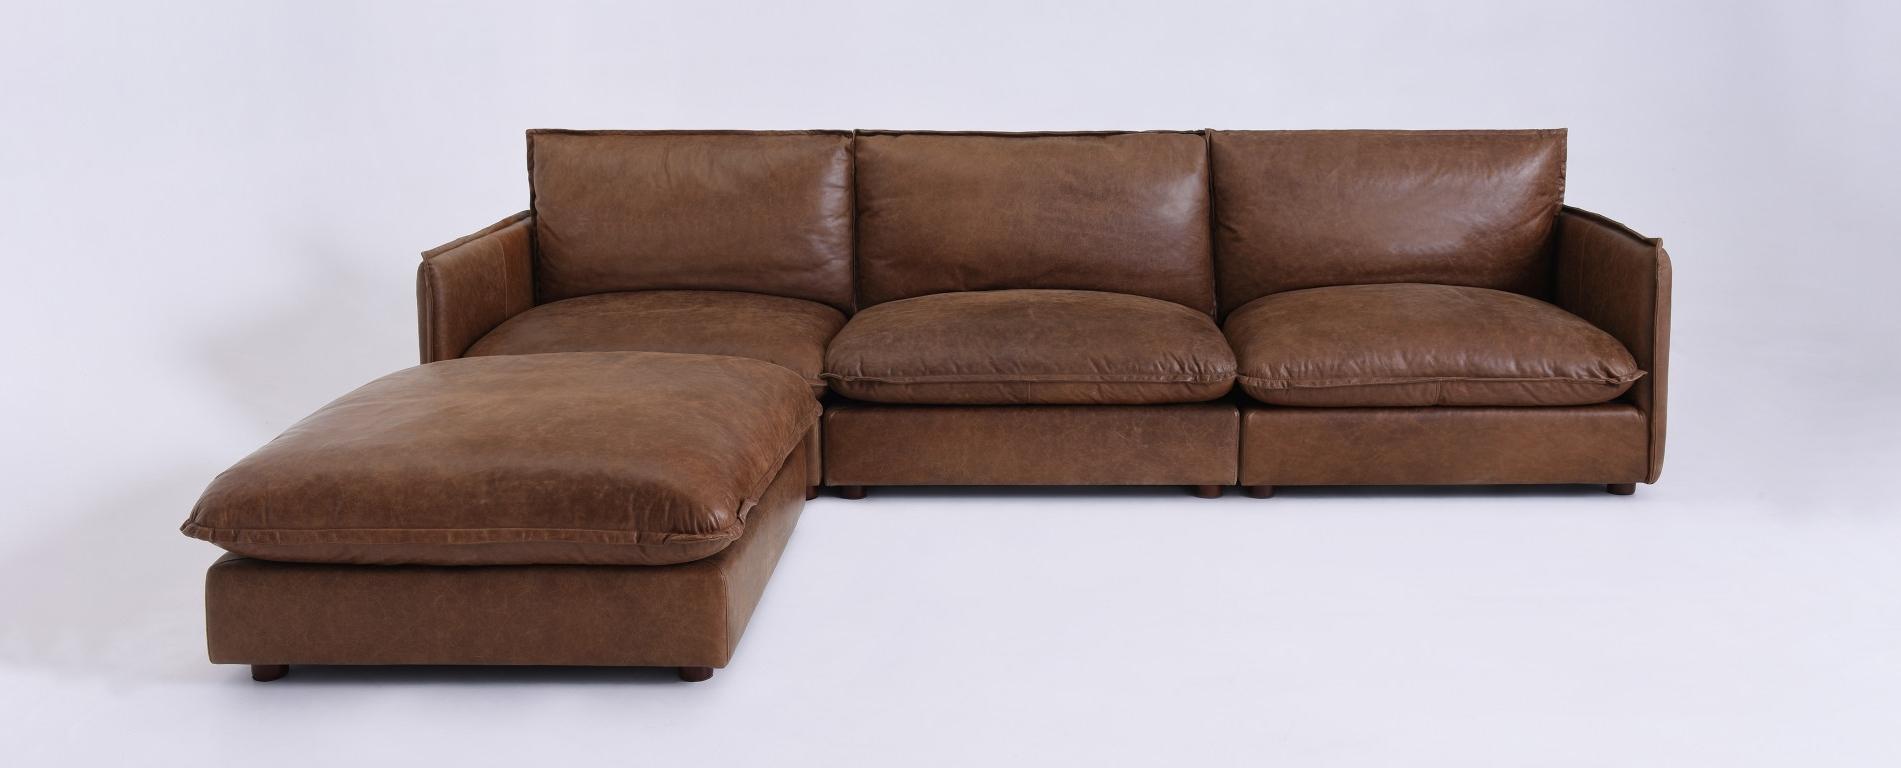 Most Popular Neva Modular Leather Chaise Sectional In Leather Chaise Sectionals (View 13 of 15)